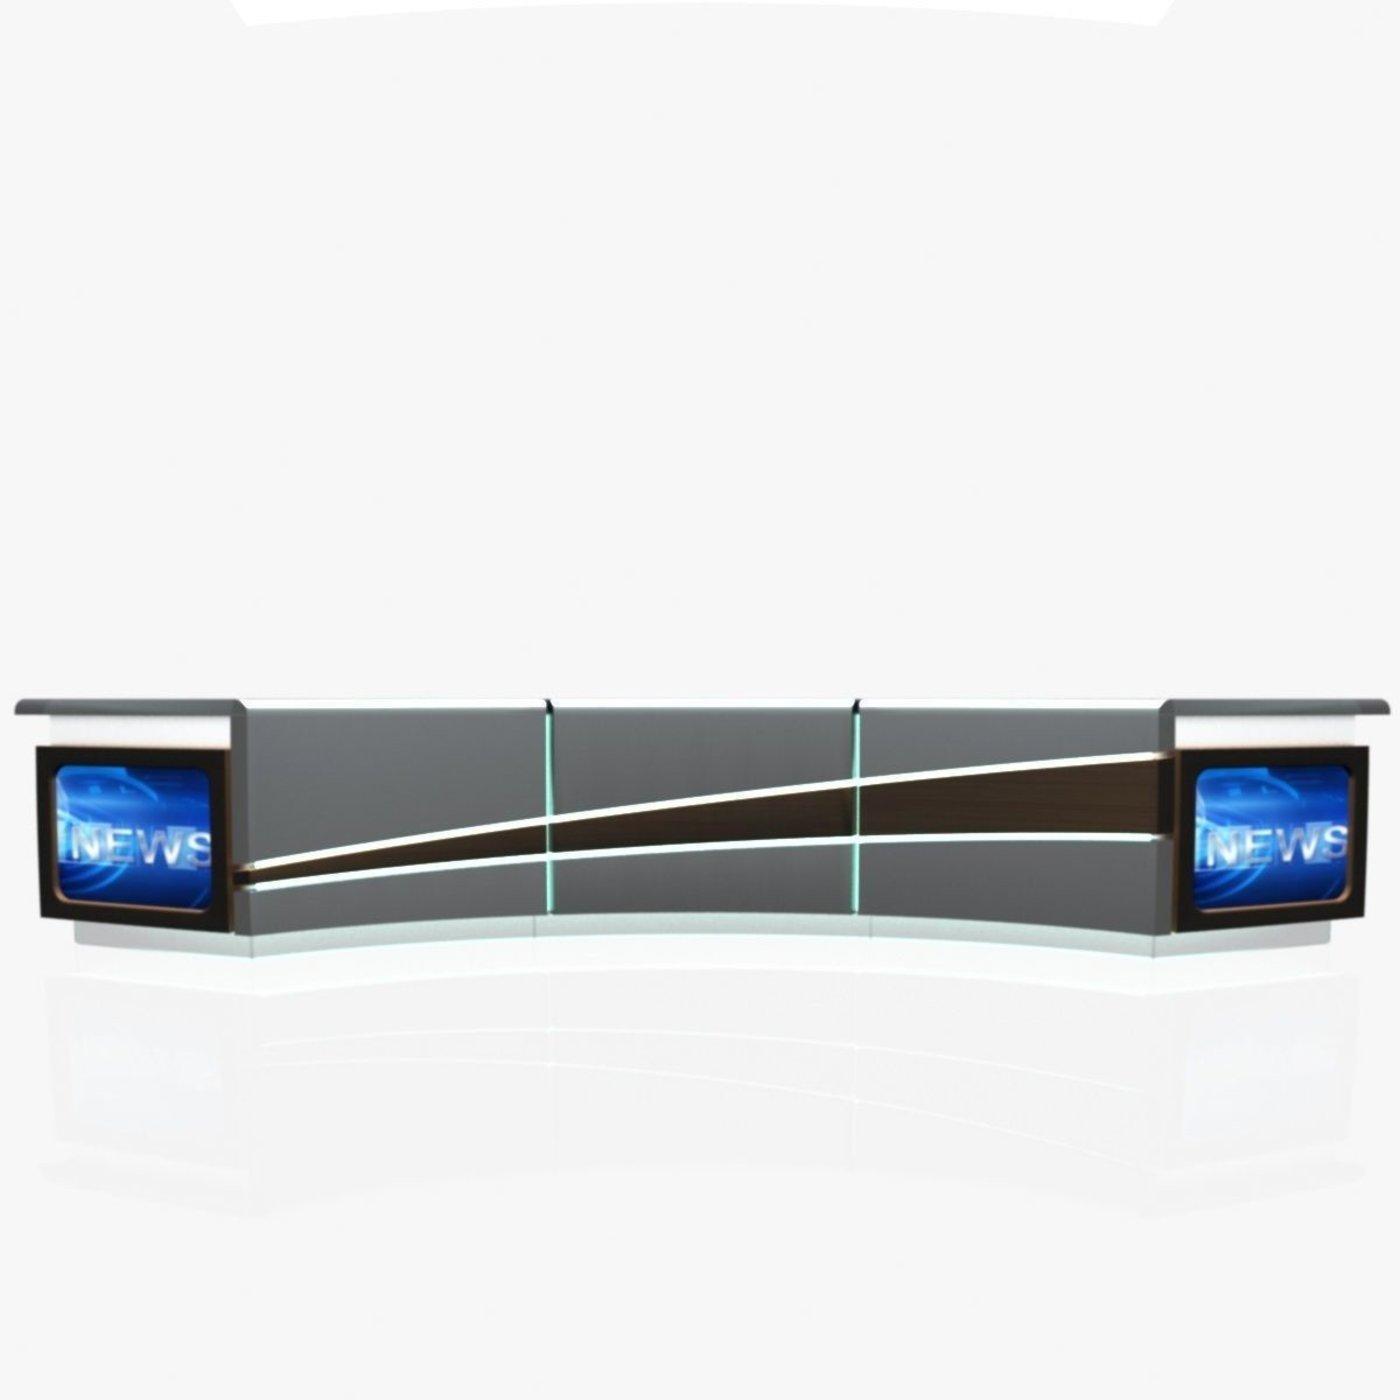 3D TV Studio News Desk 4